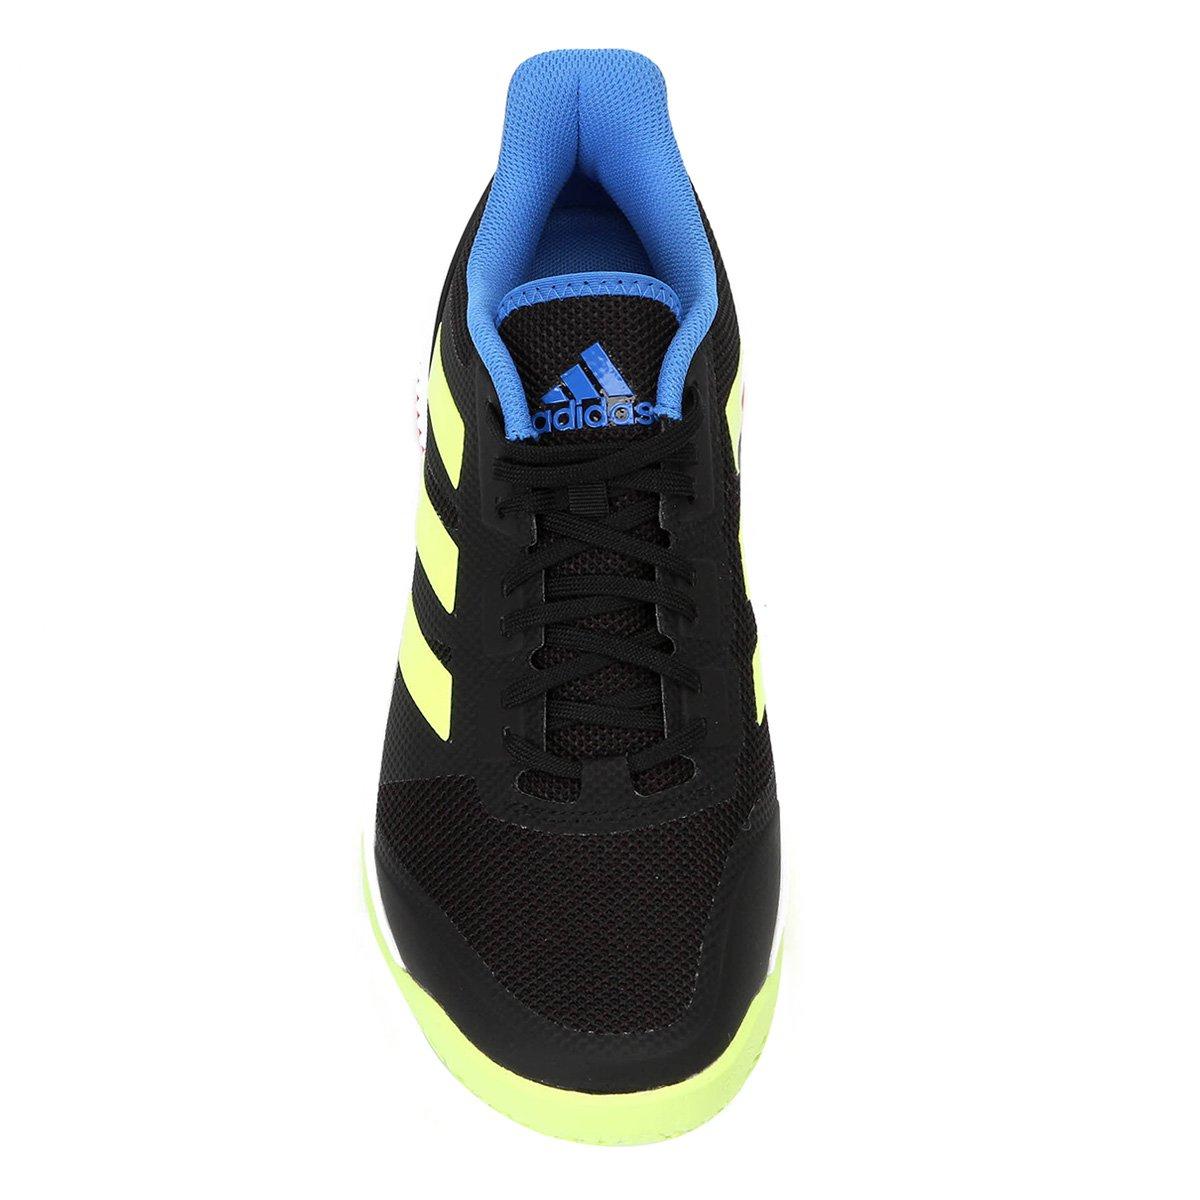 0537286d75e Tênis Adidas Stabil Bounce Masculino - Shopping TudoAzul